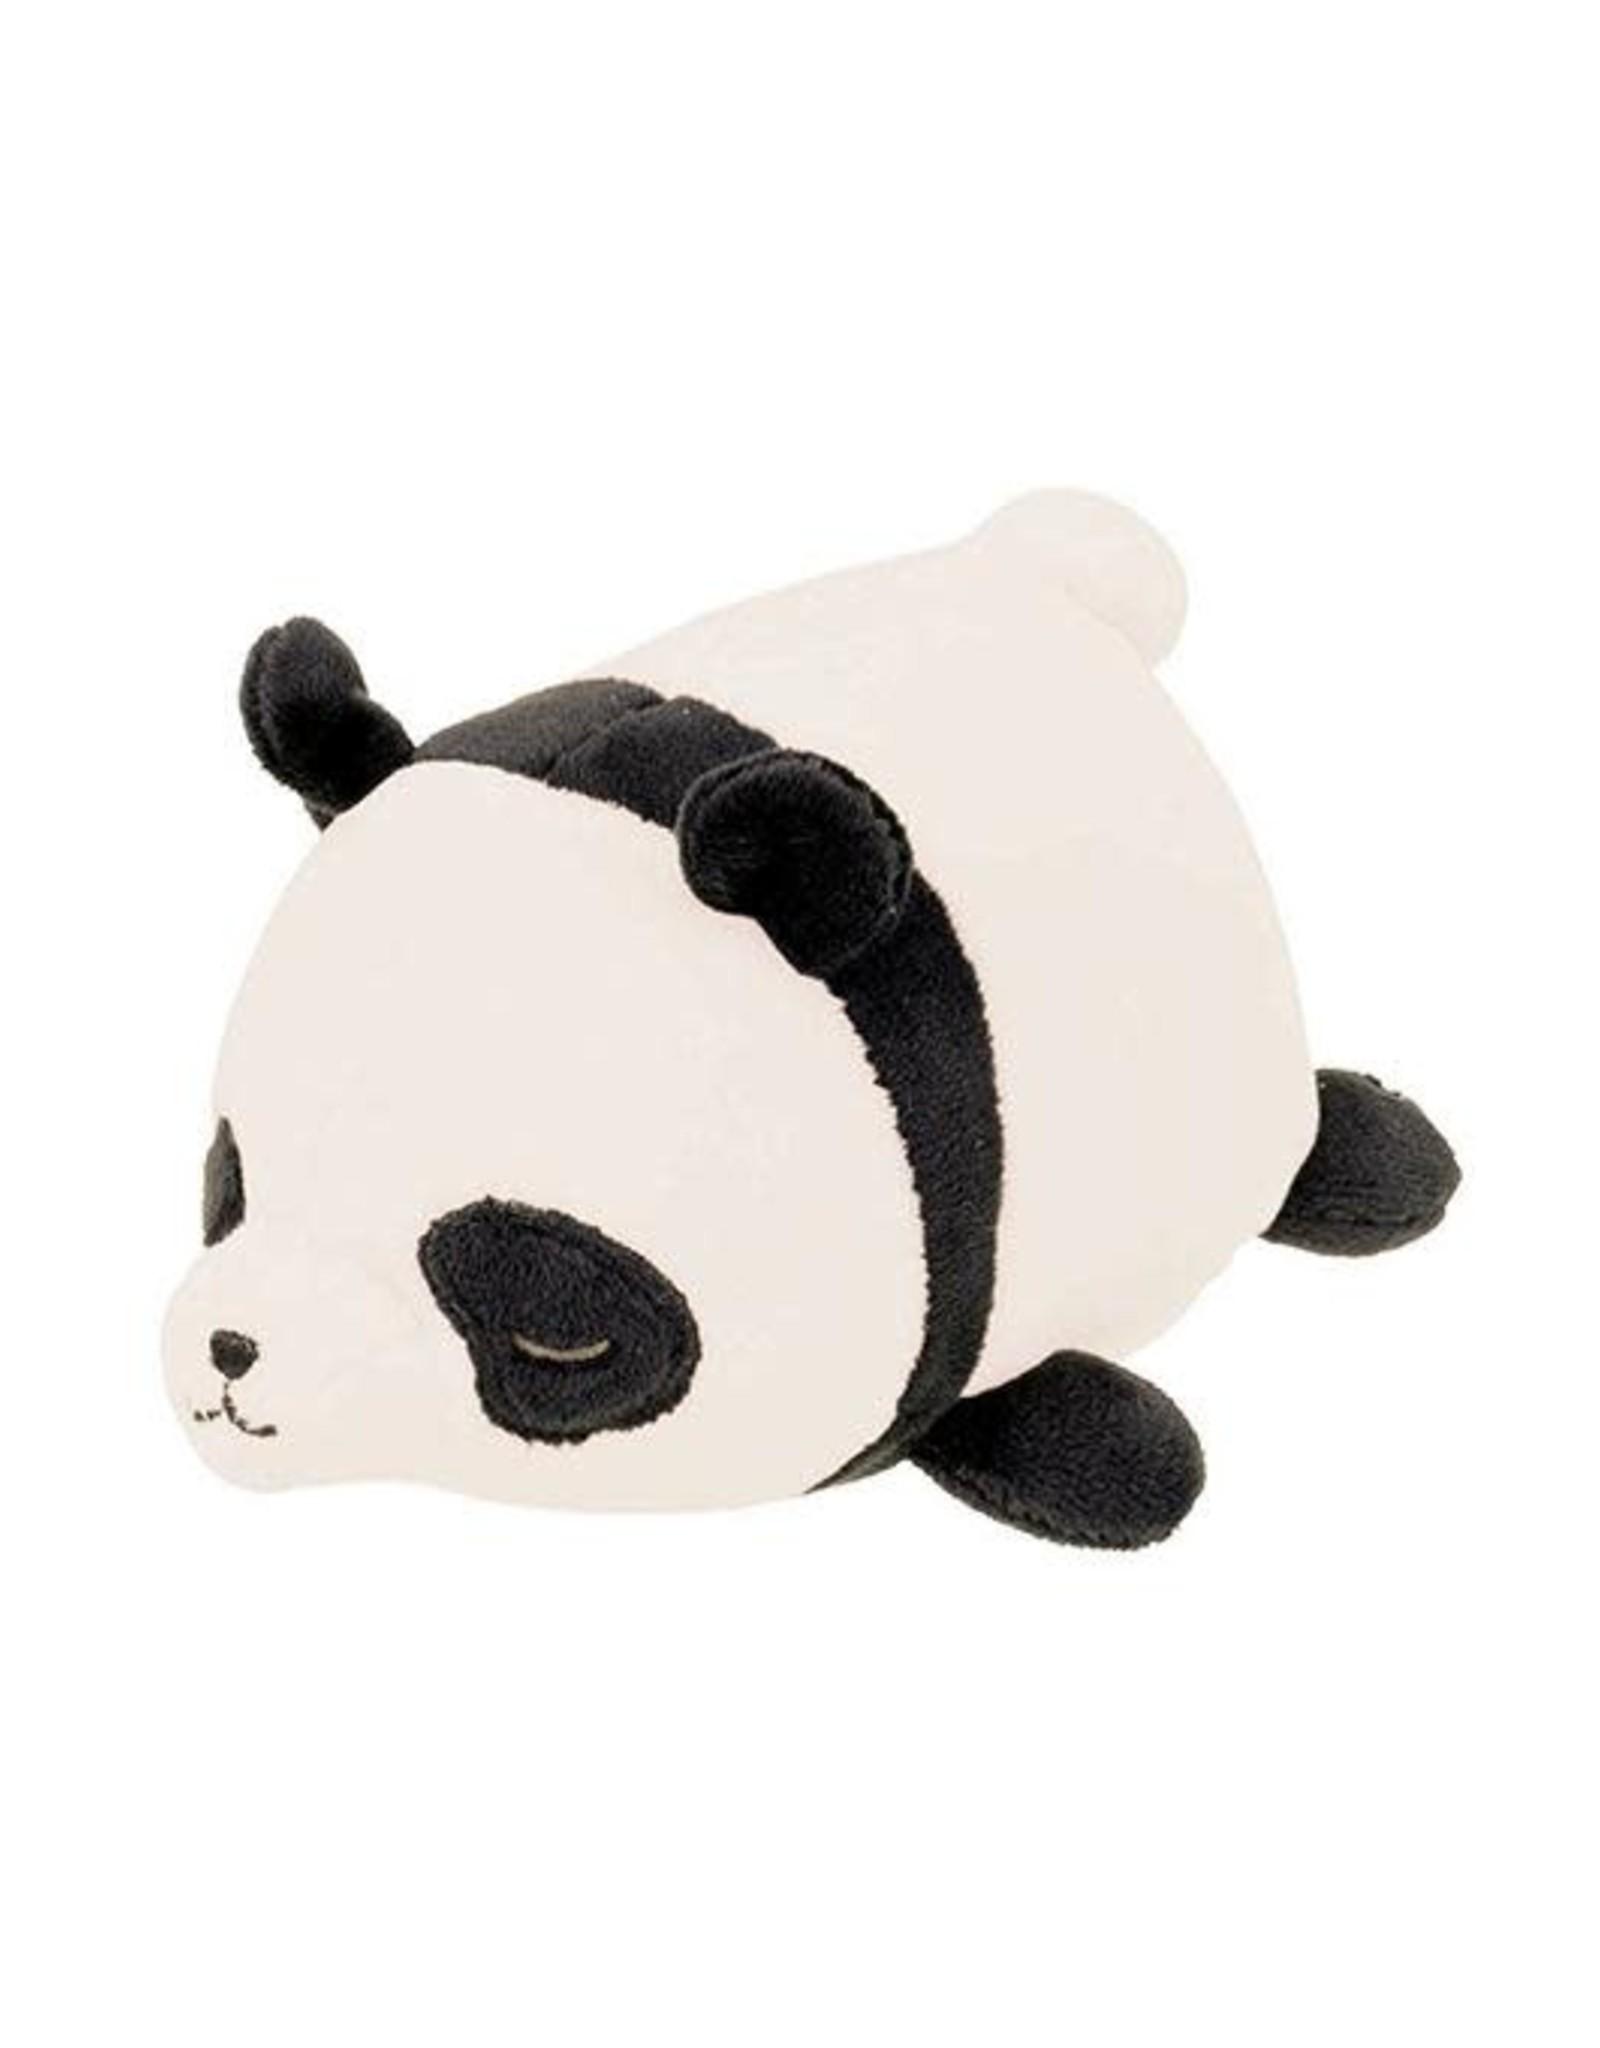 Nemu Nemu Paopao - Le Panda - Small